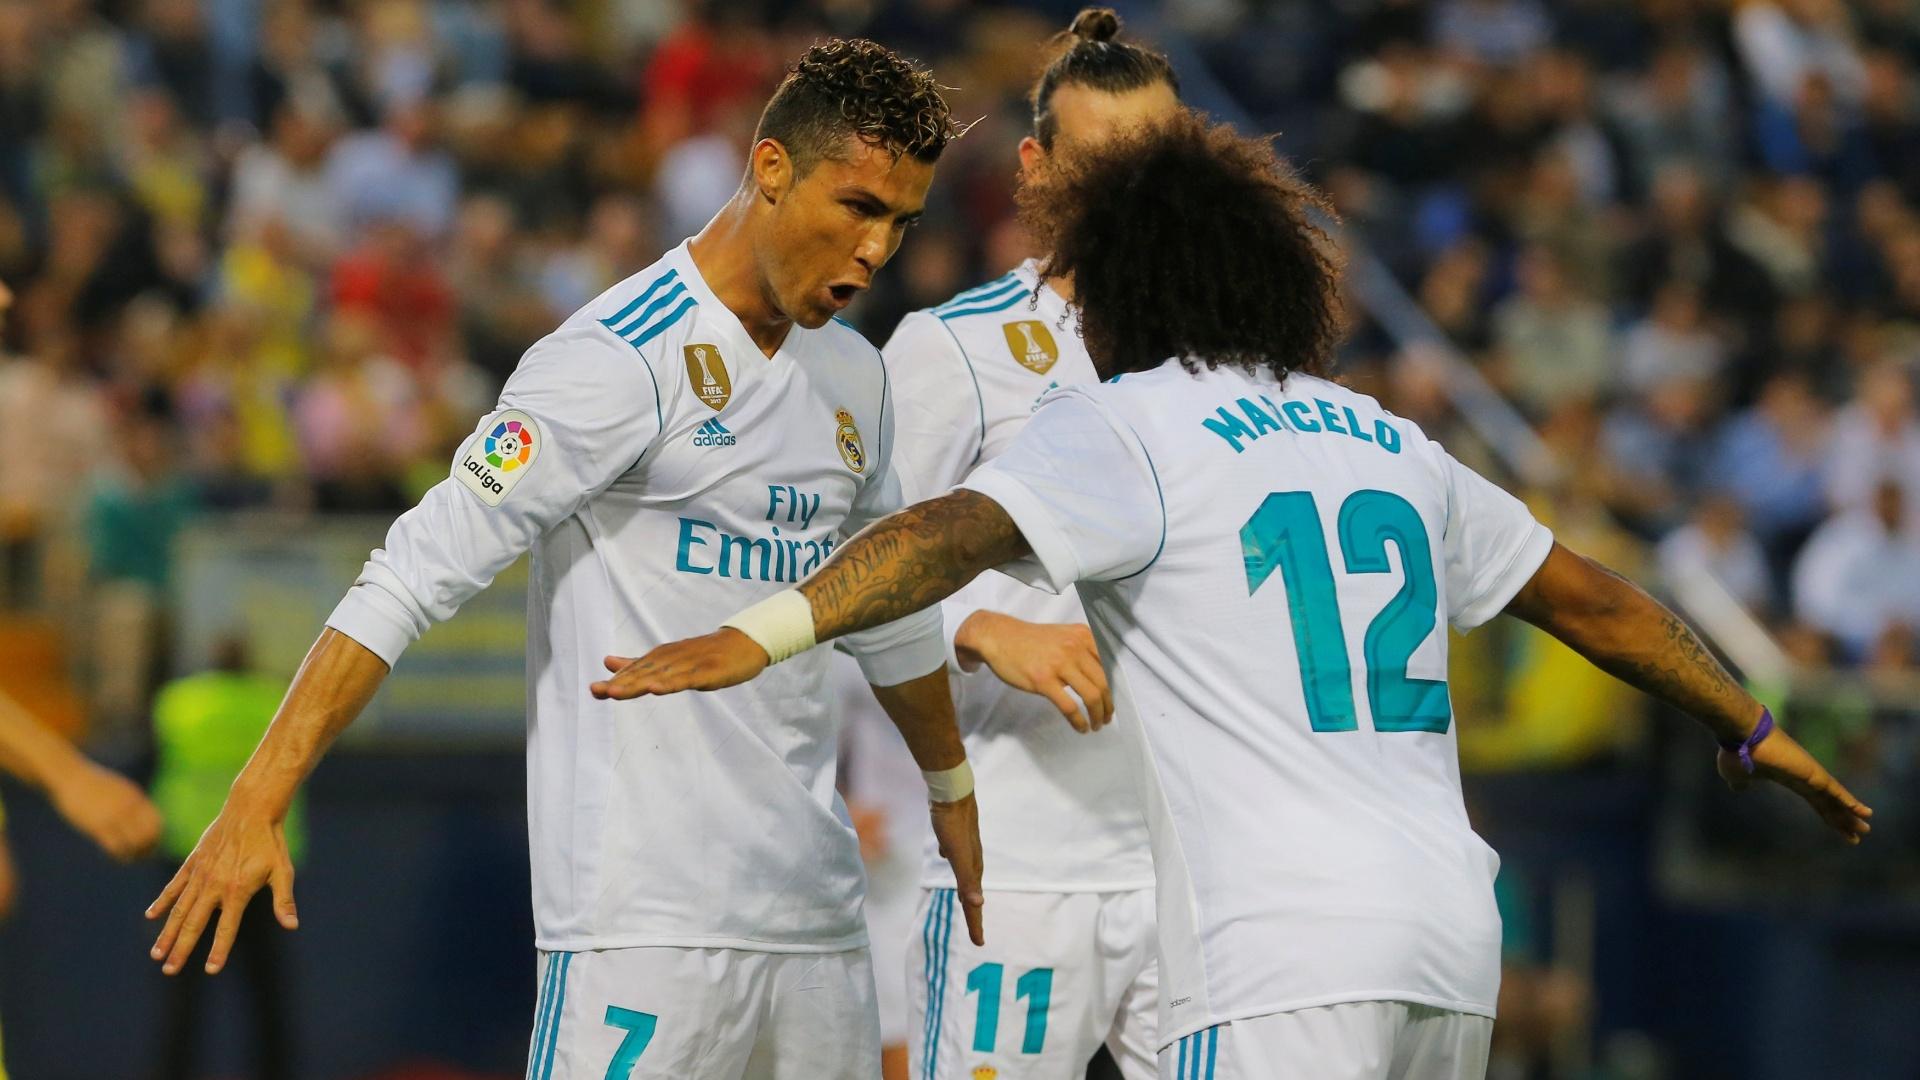 Cristiano Ronaldo e Marcelo comemoram gol do Real Madrid sobre o Villarreal